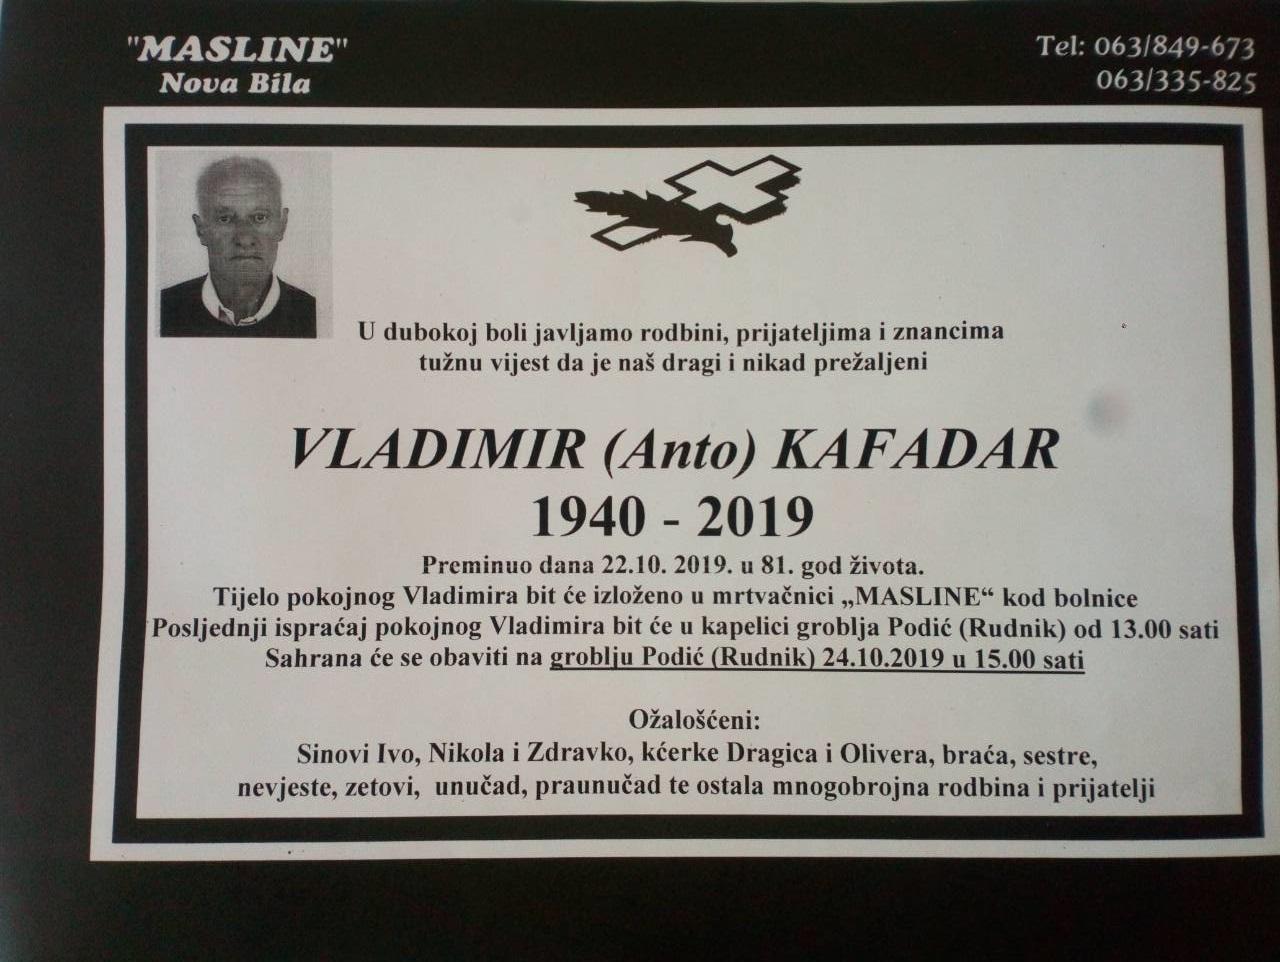 Vladimir Kafadar